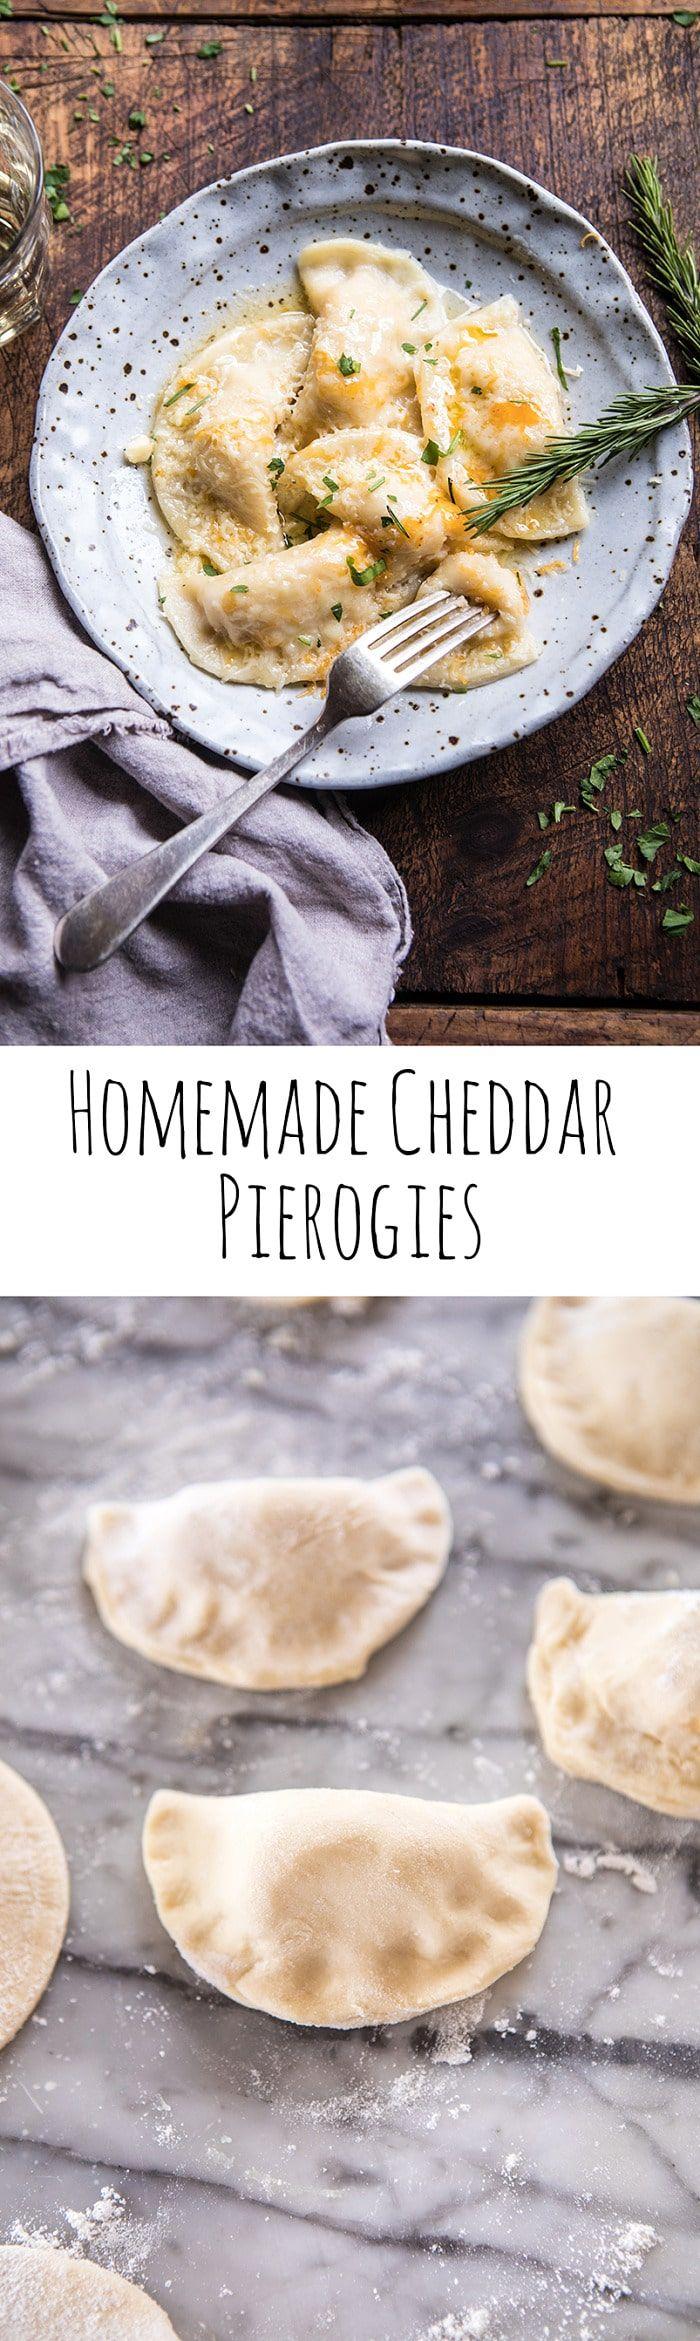 Homemade Cheddar Pierogies | halfbakedharvest.com @hbharvest